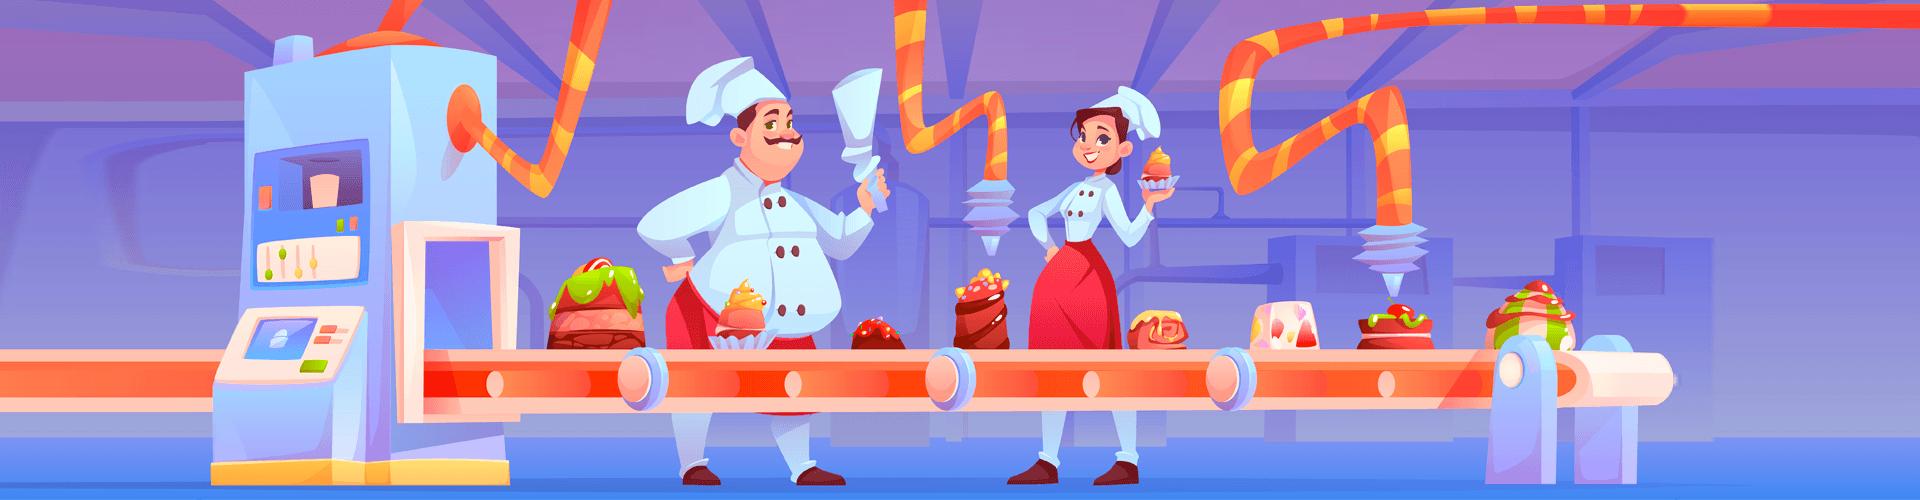 повар кондитер профессия